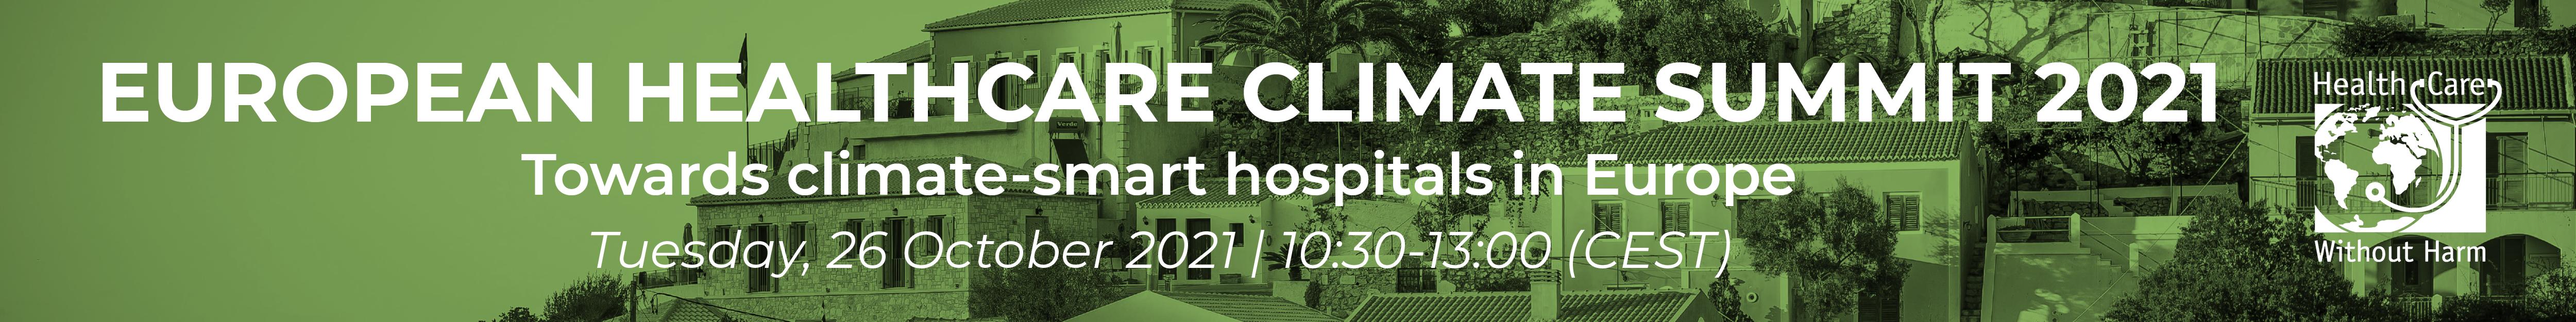 European Healthcare Climate Summit 2021